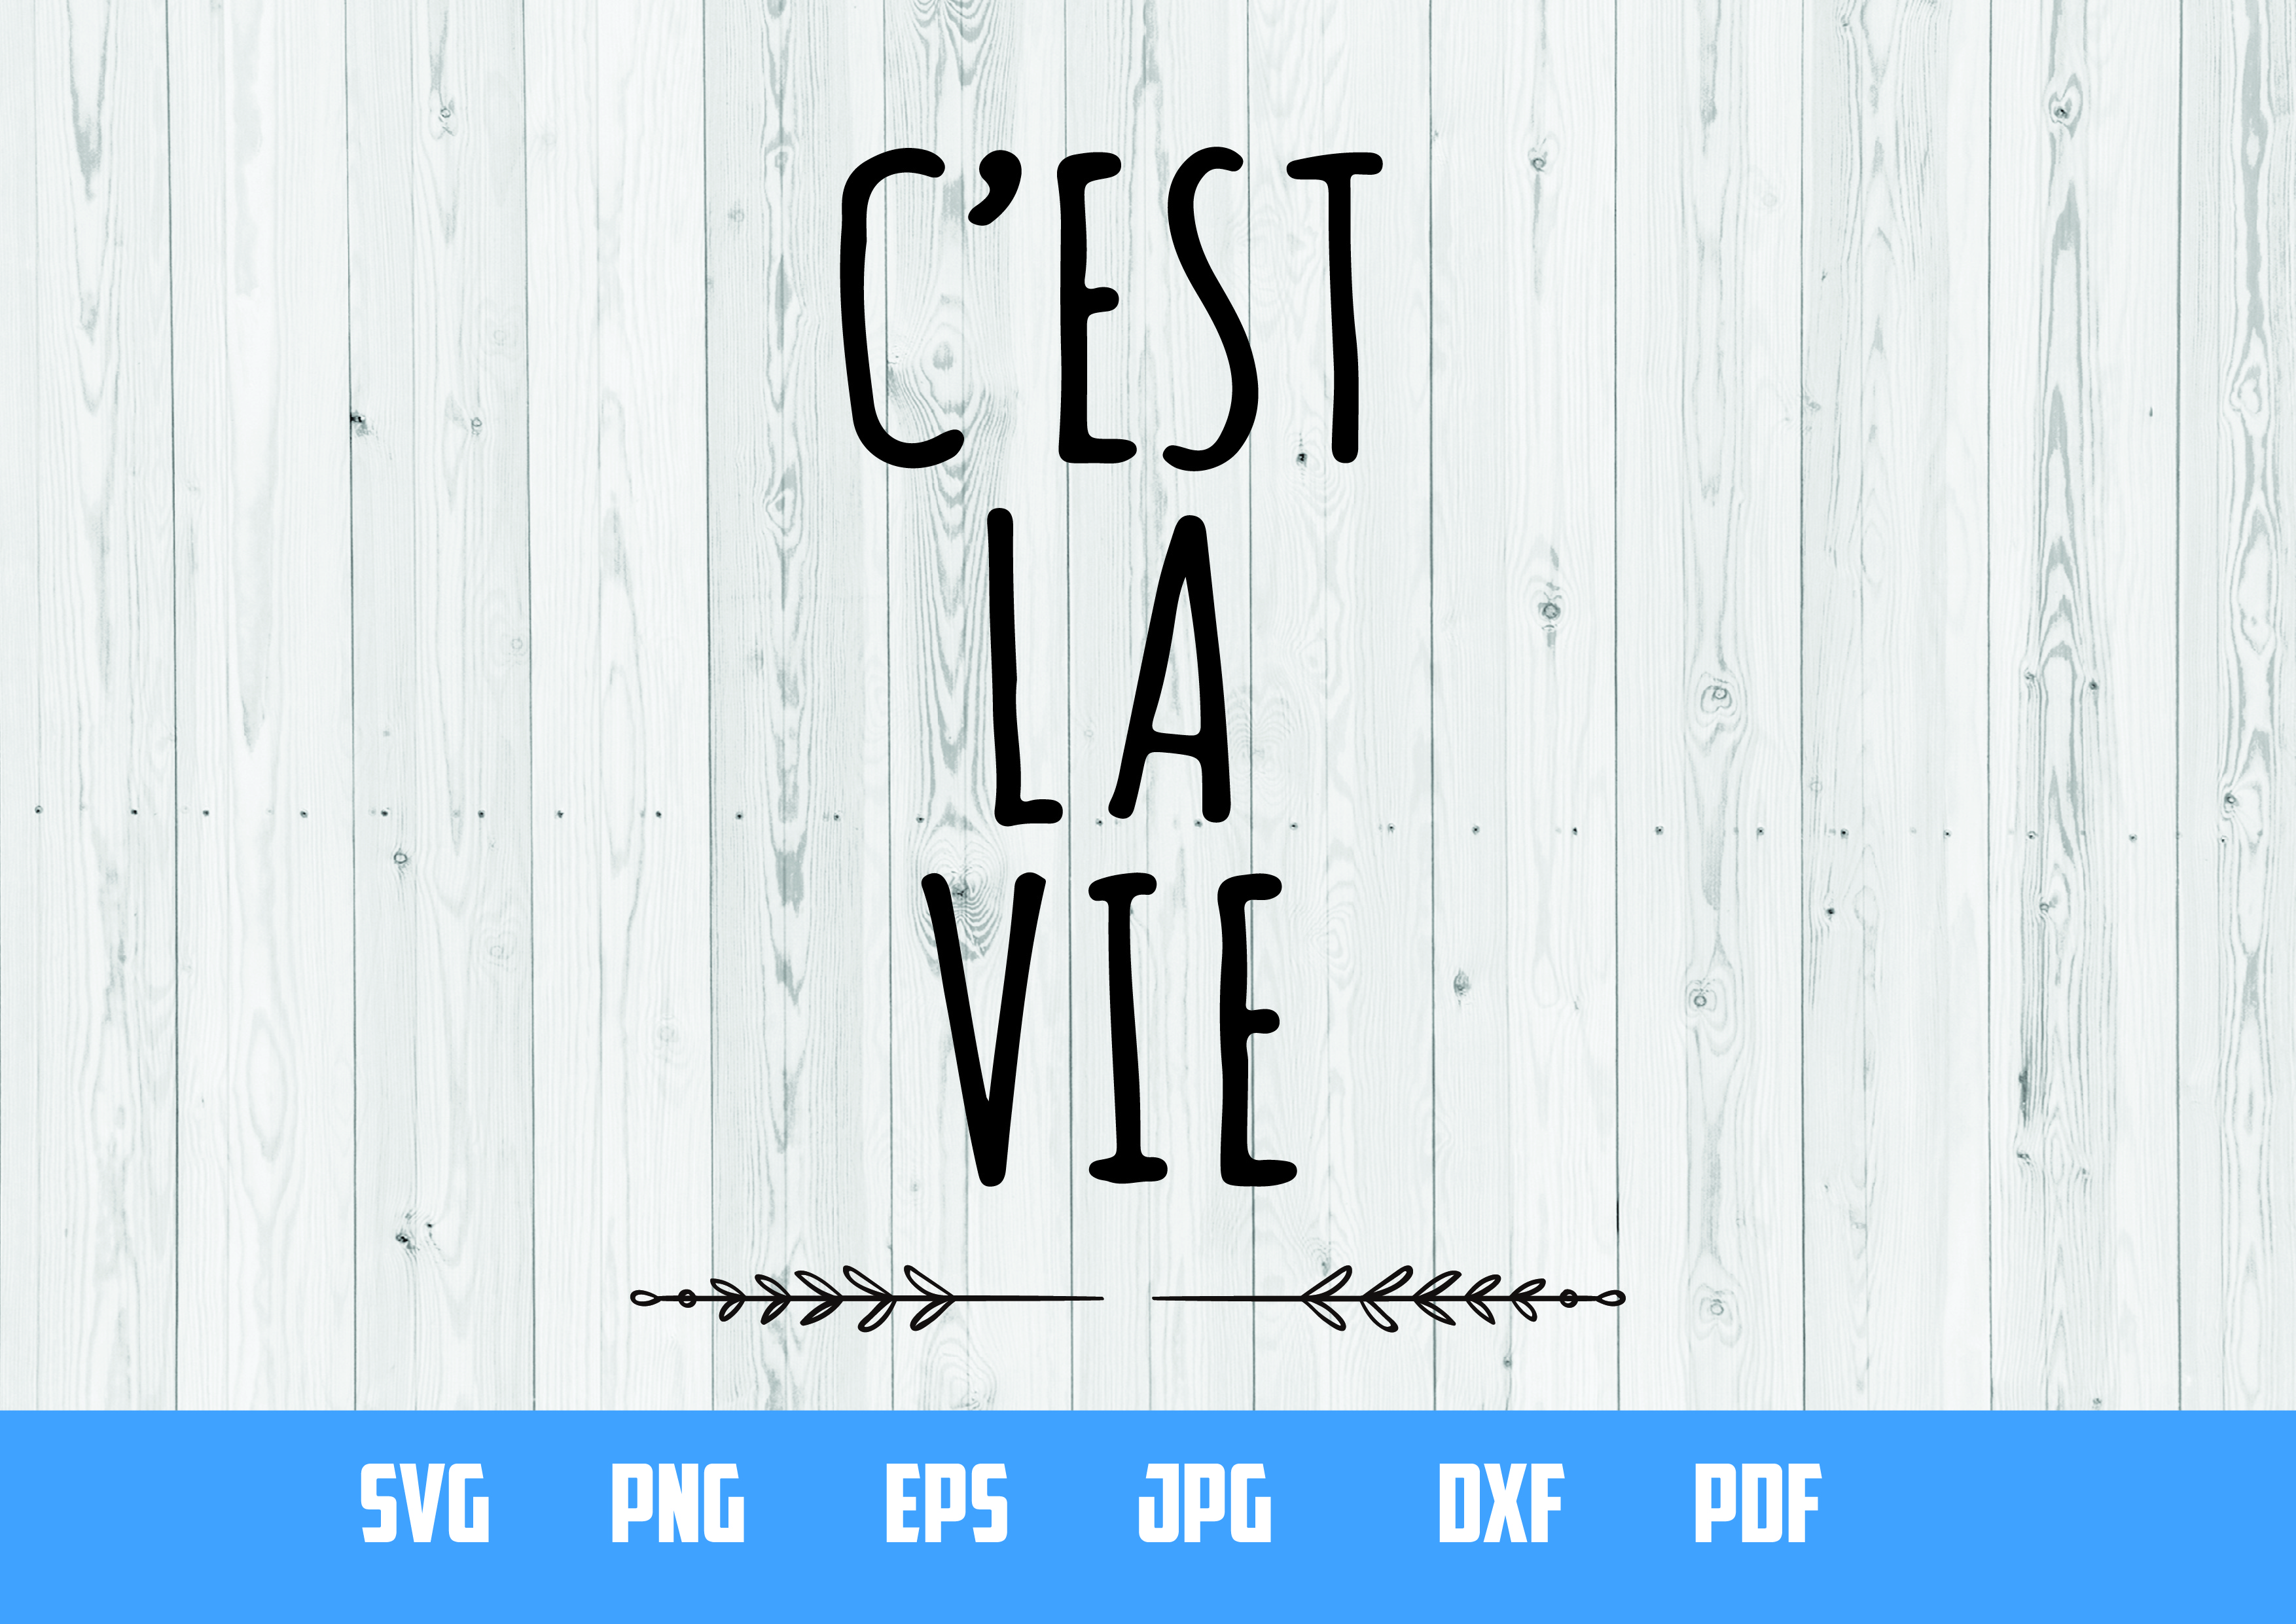 C'est la vie Printable Designc   SVG Cut File   example image 1